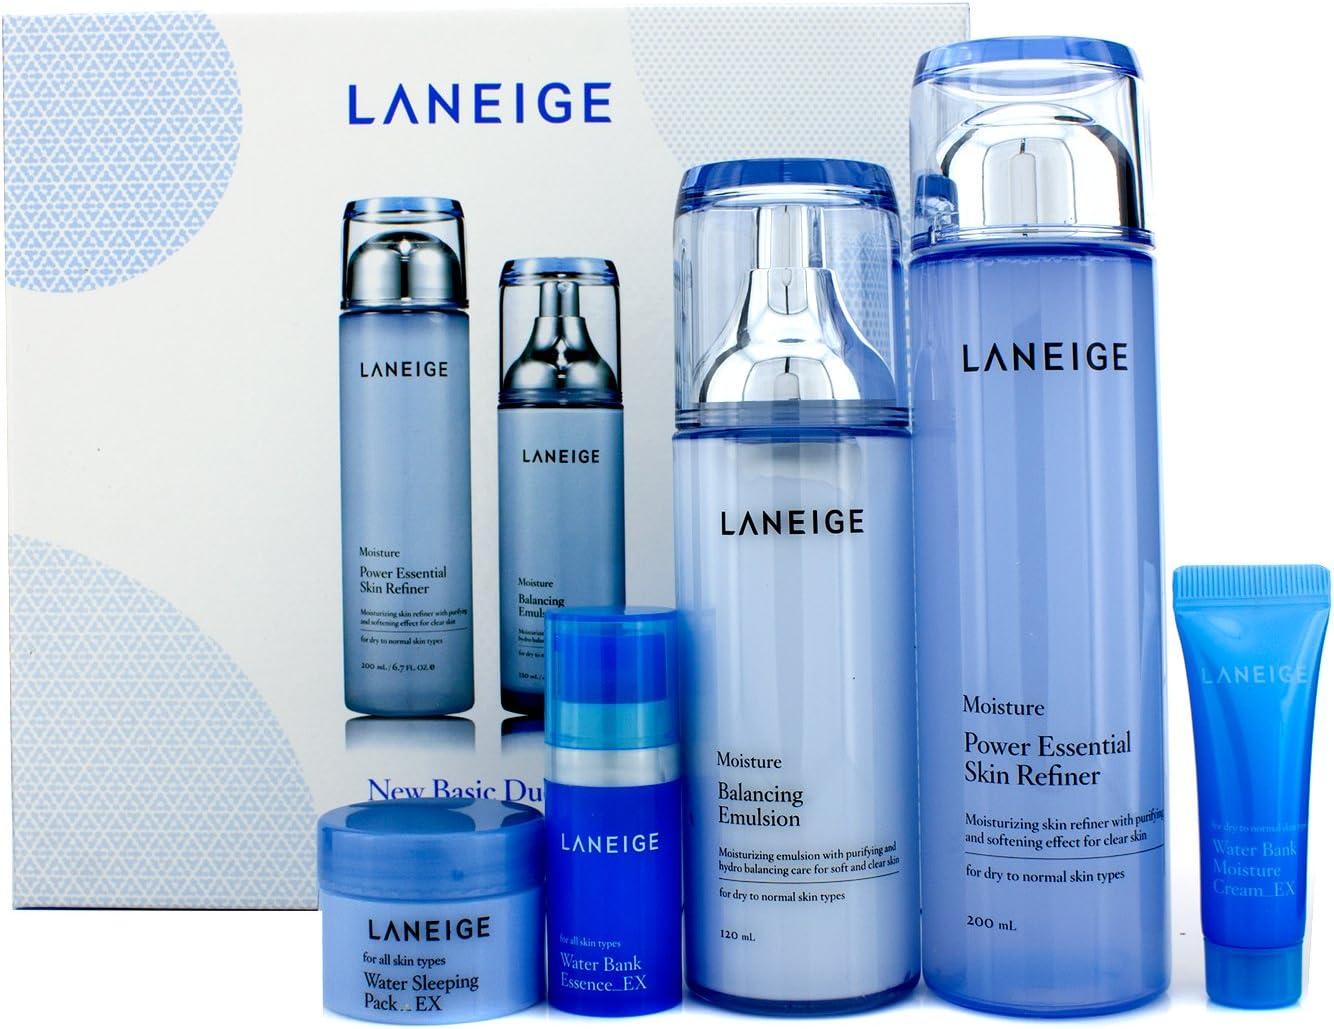 Laneige Basic Duo Set (Moisture): Skin Refiner + Emulsion + Sleeping Pack EX + Essence EX + Moisture Cream EX 5pcs: Amazon.es: Belleza